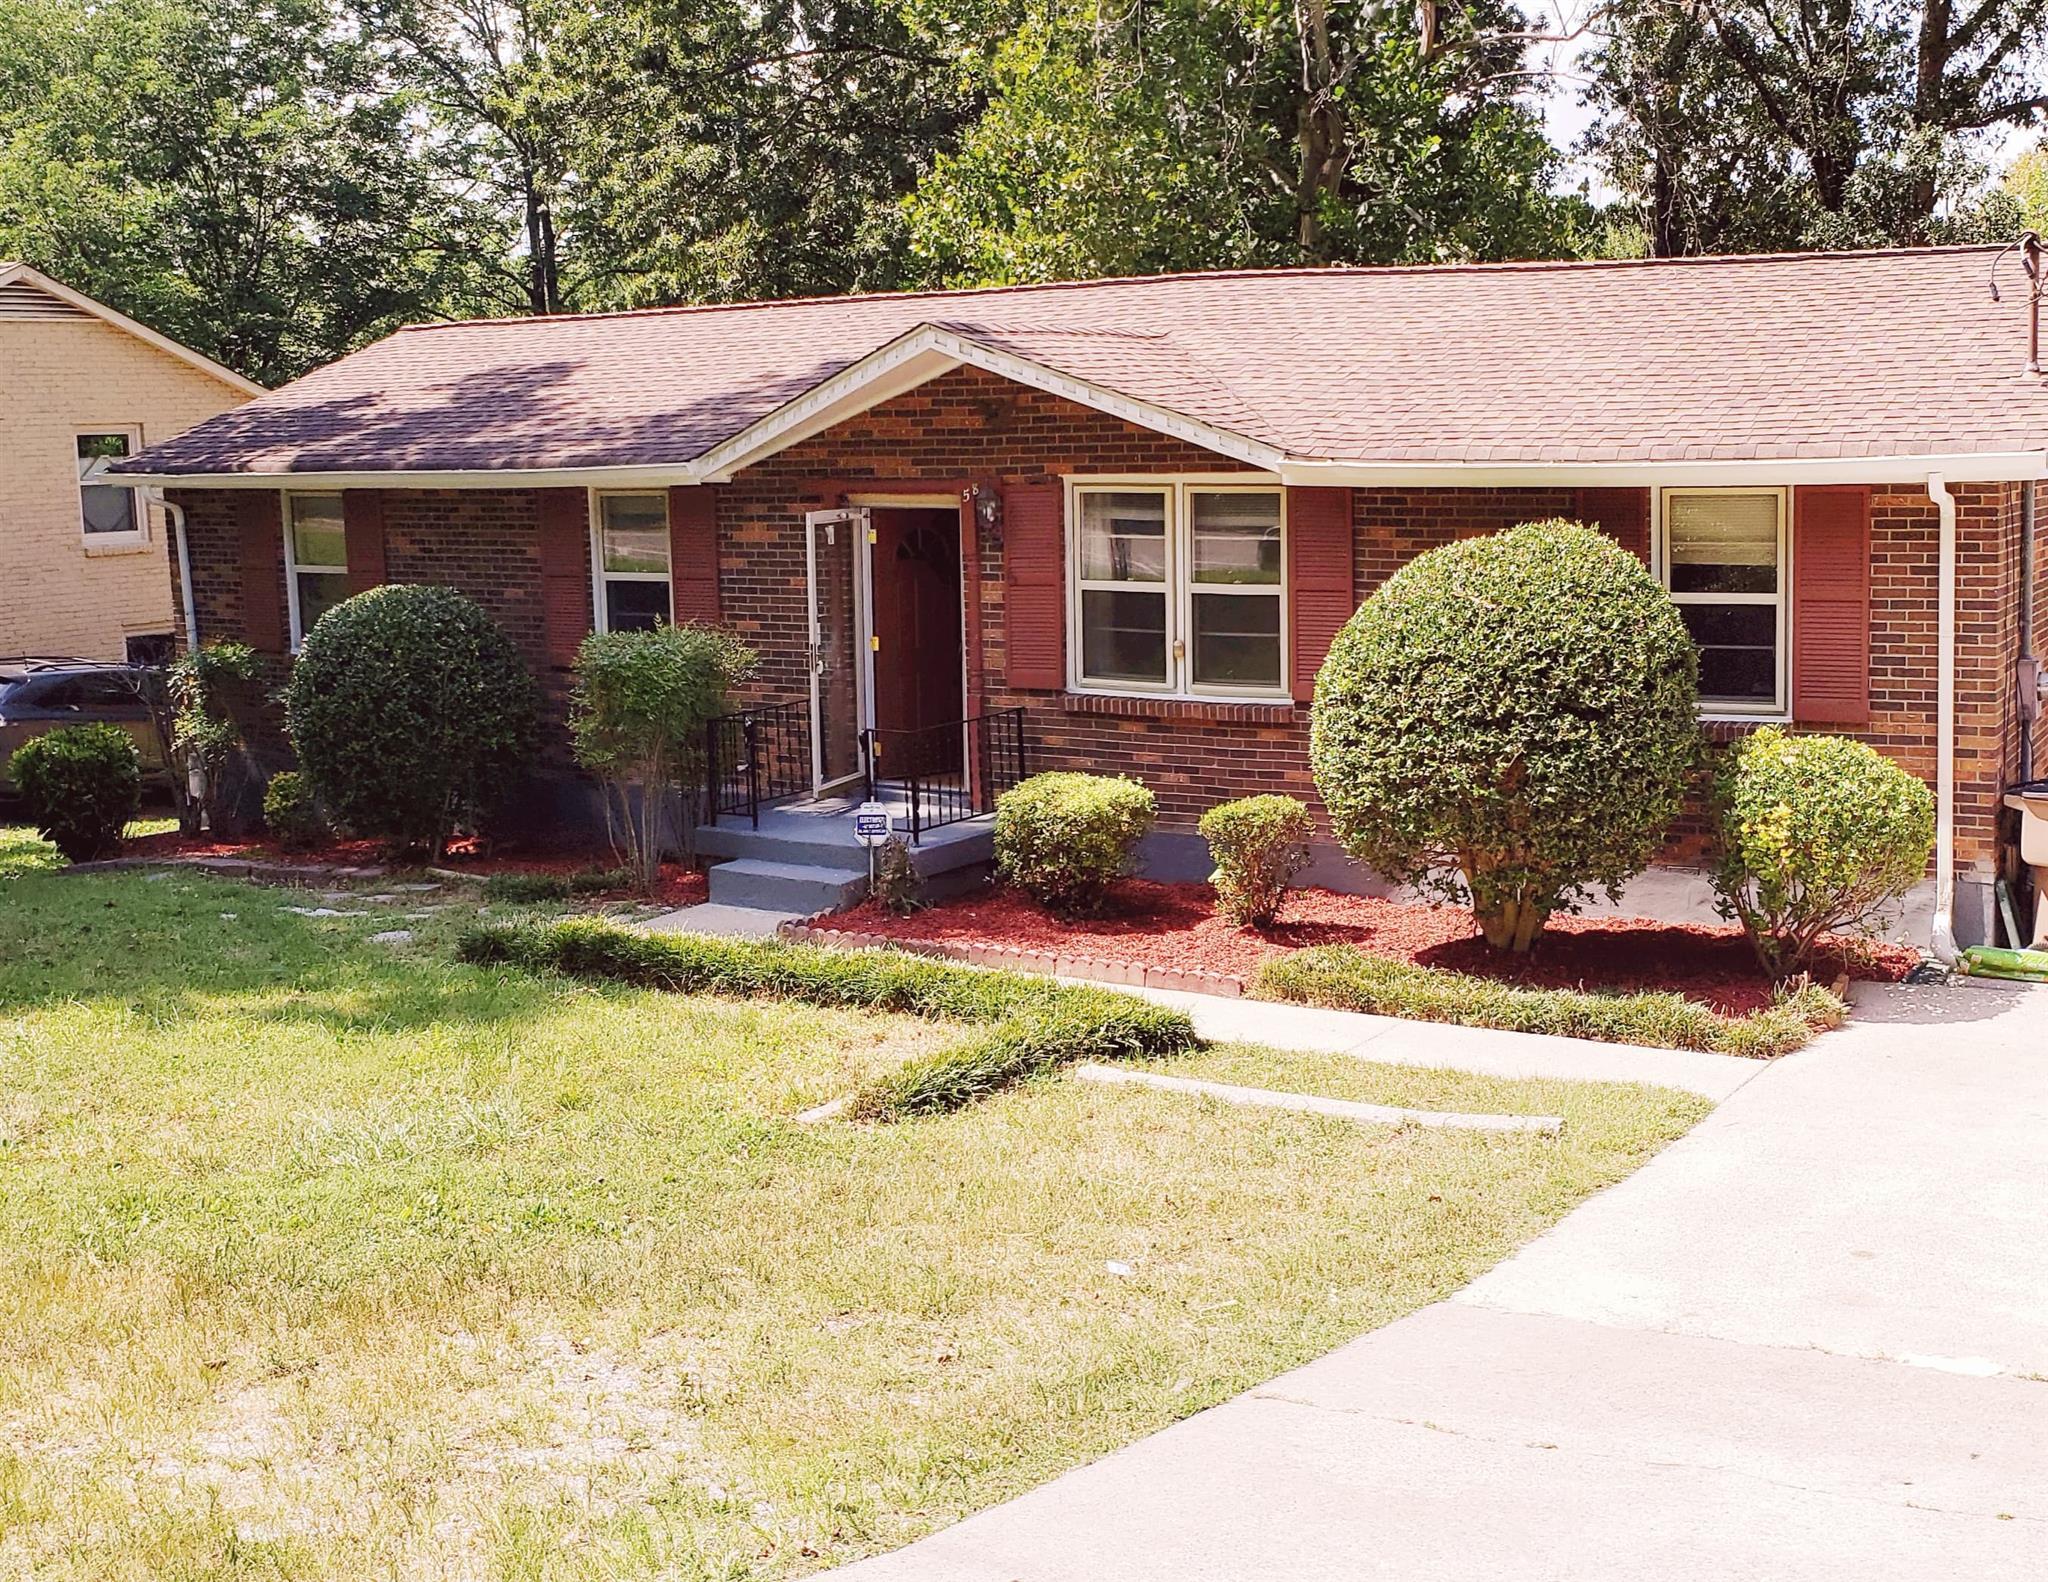 58 Tusculum Rd, Antioch, TN 37013 - Antioch, TN real estate listing